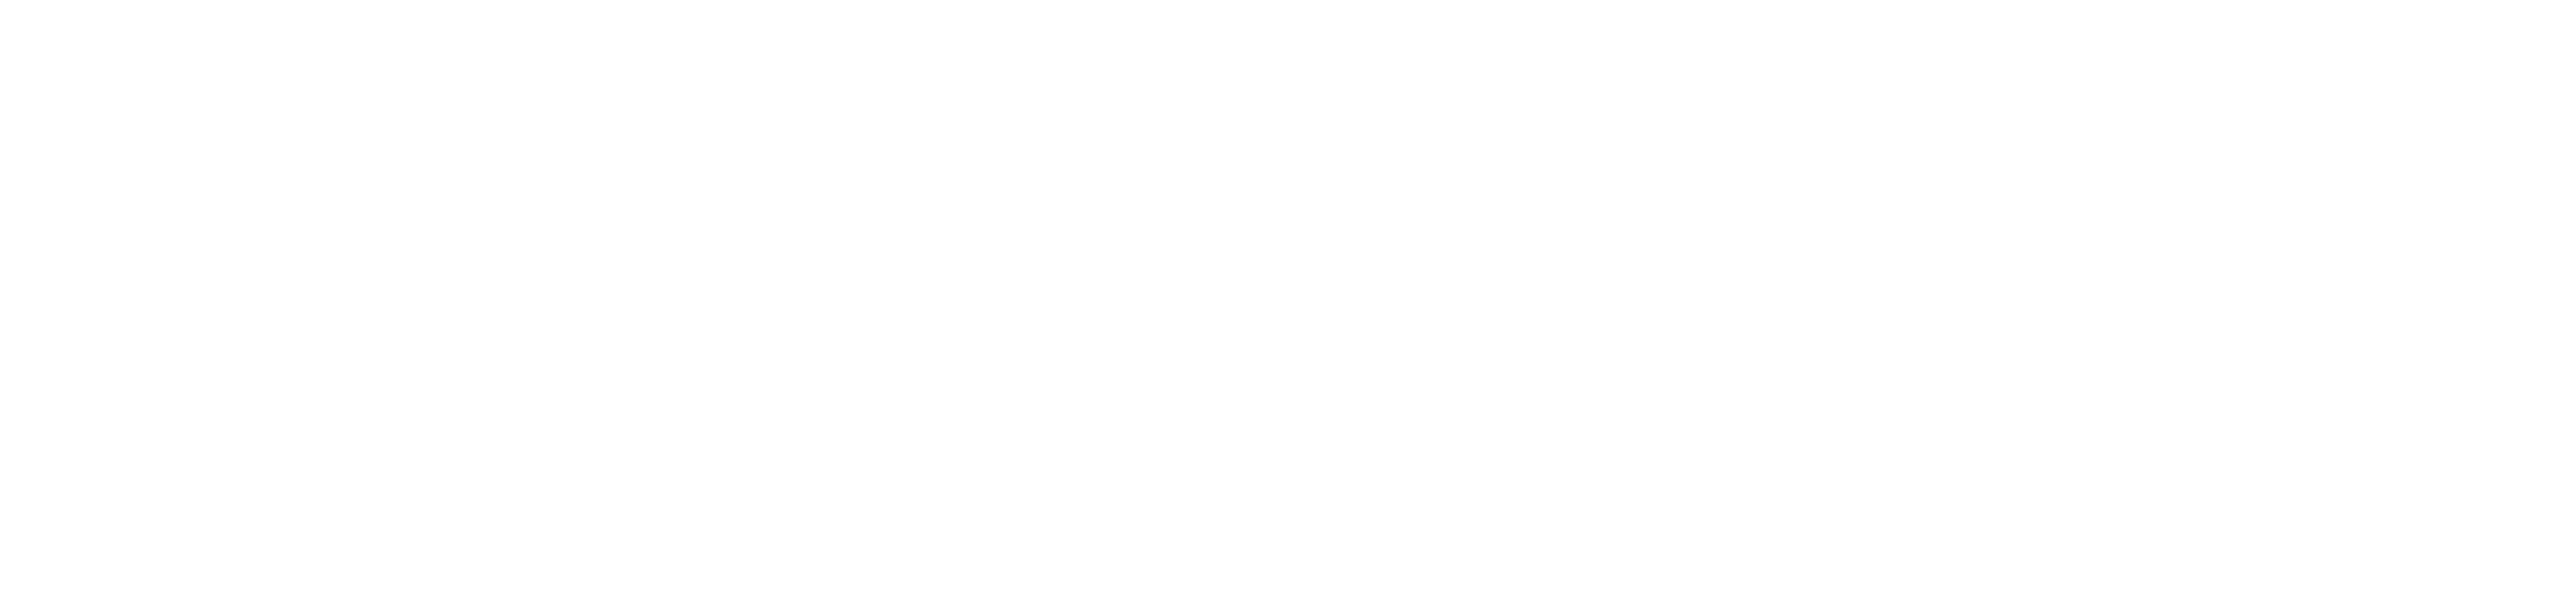 Cyberlunes